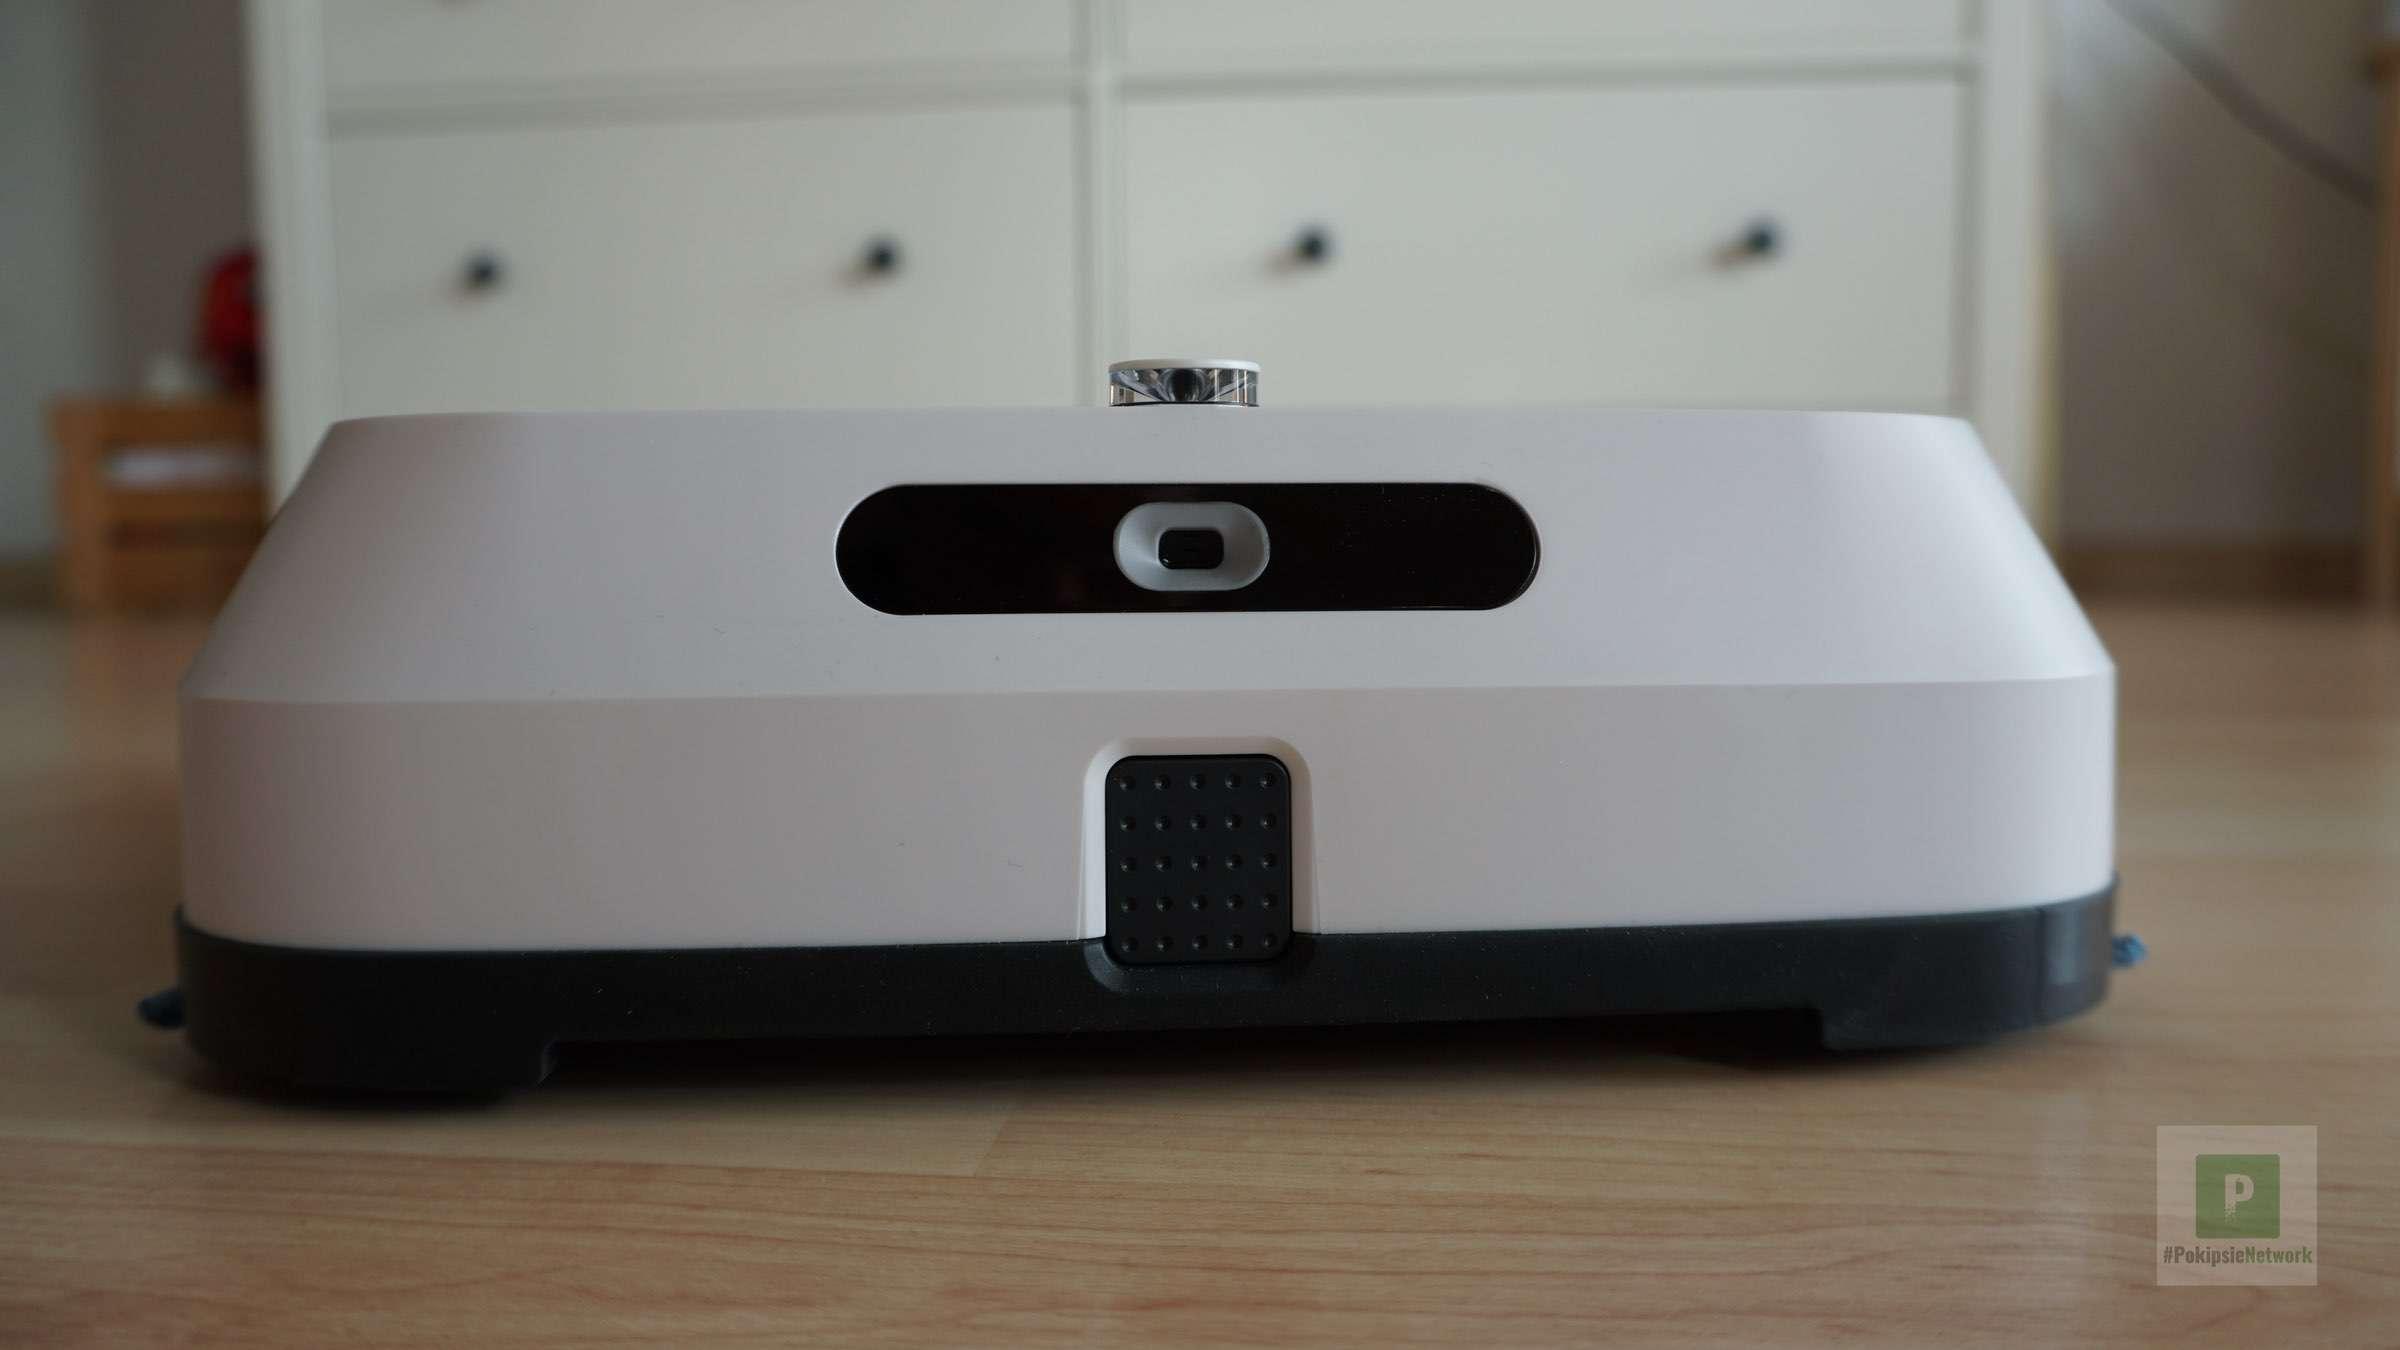 iRobot Roomba in Apple HomeKit nutzen?